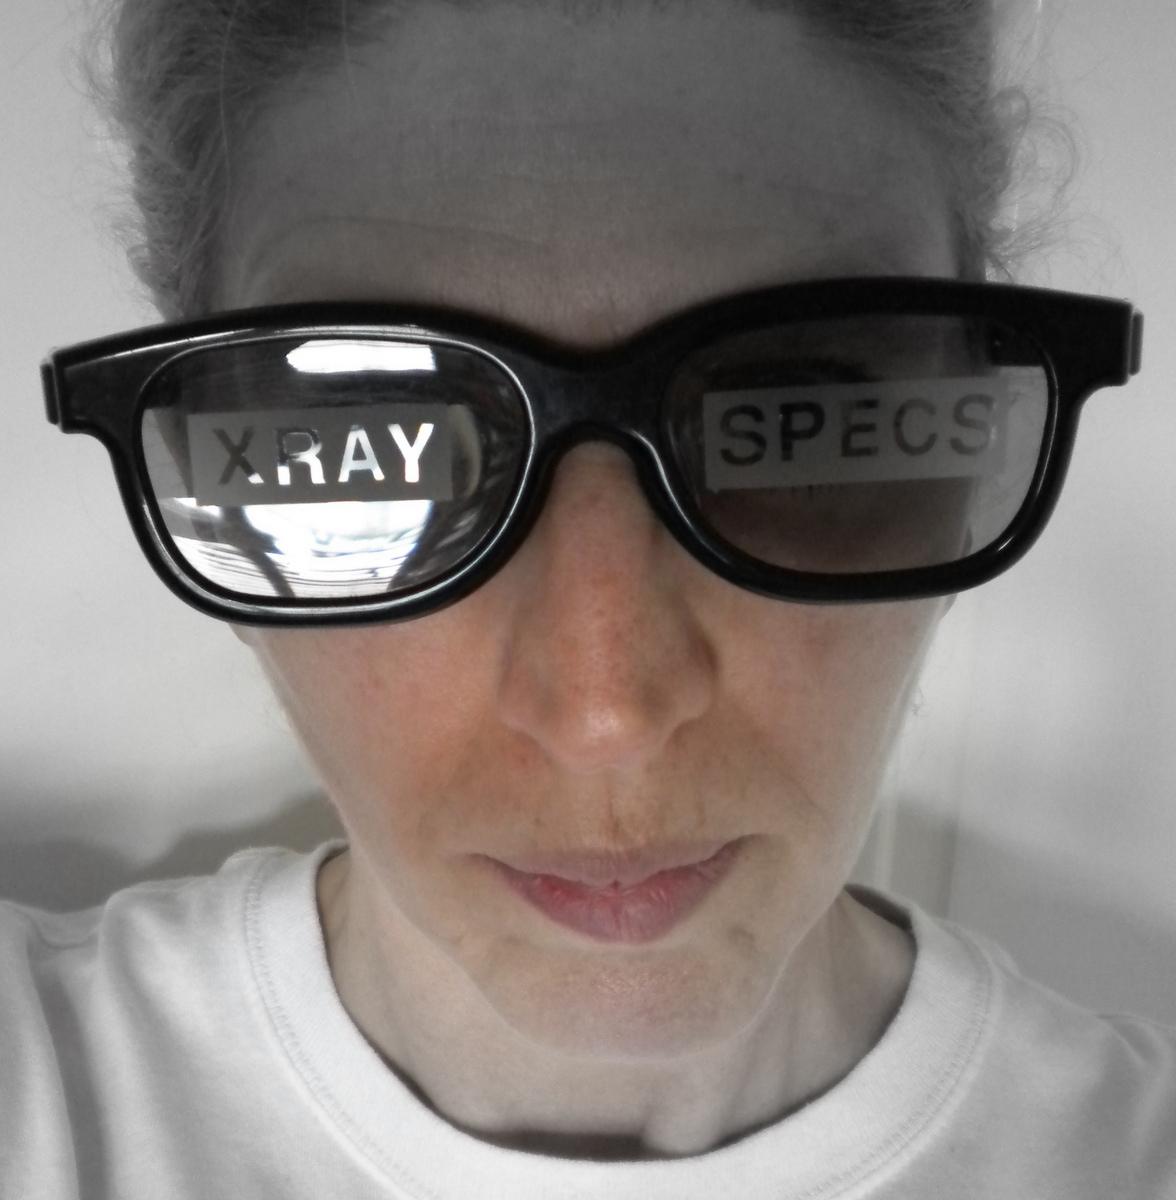 Protective Eyewear Xray Specs 2010.JPG